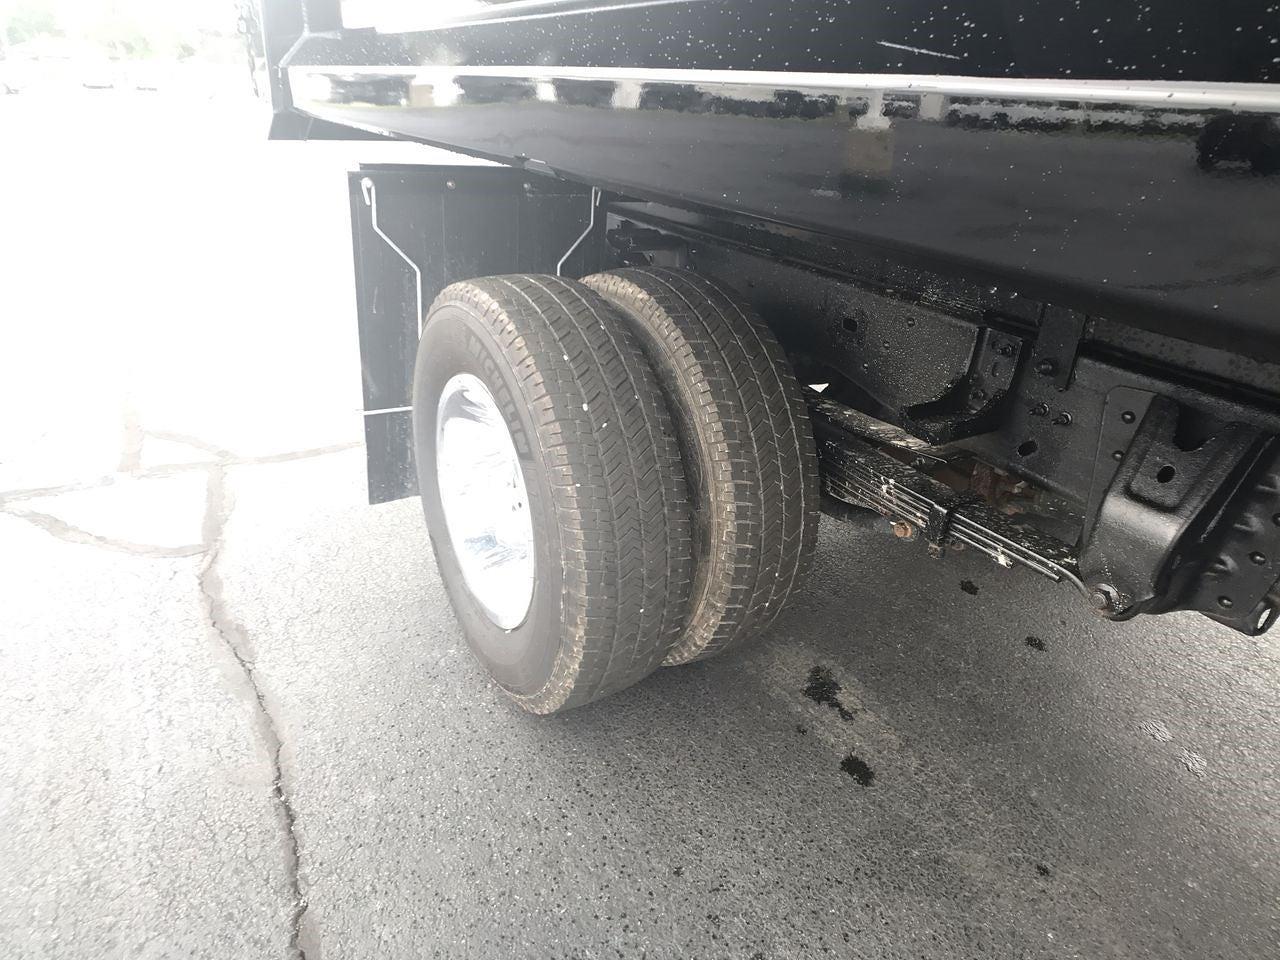 2019 Silverado 3500 Regular Cab DRW 4x4,  Dump Body #111653 - photo 10